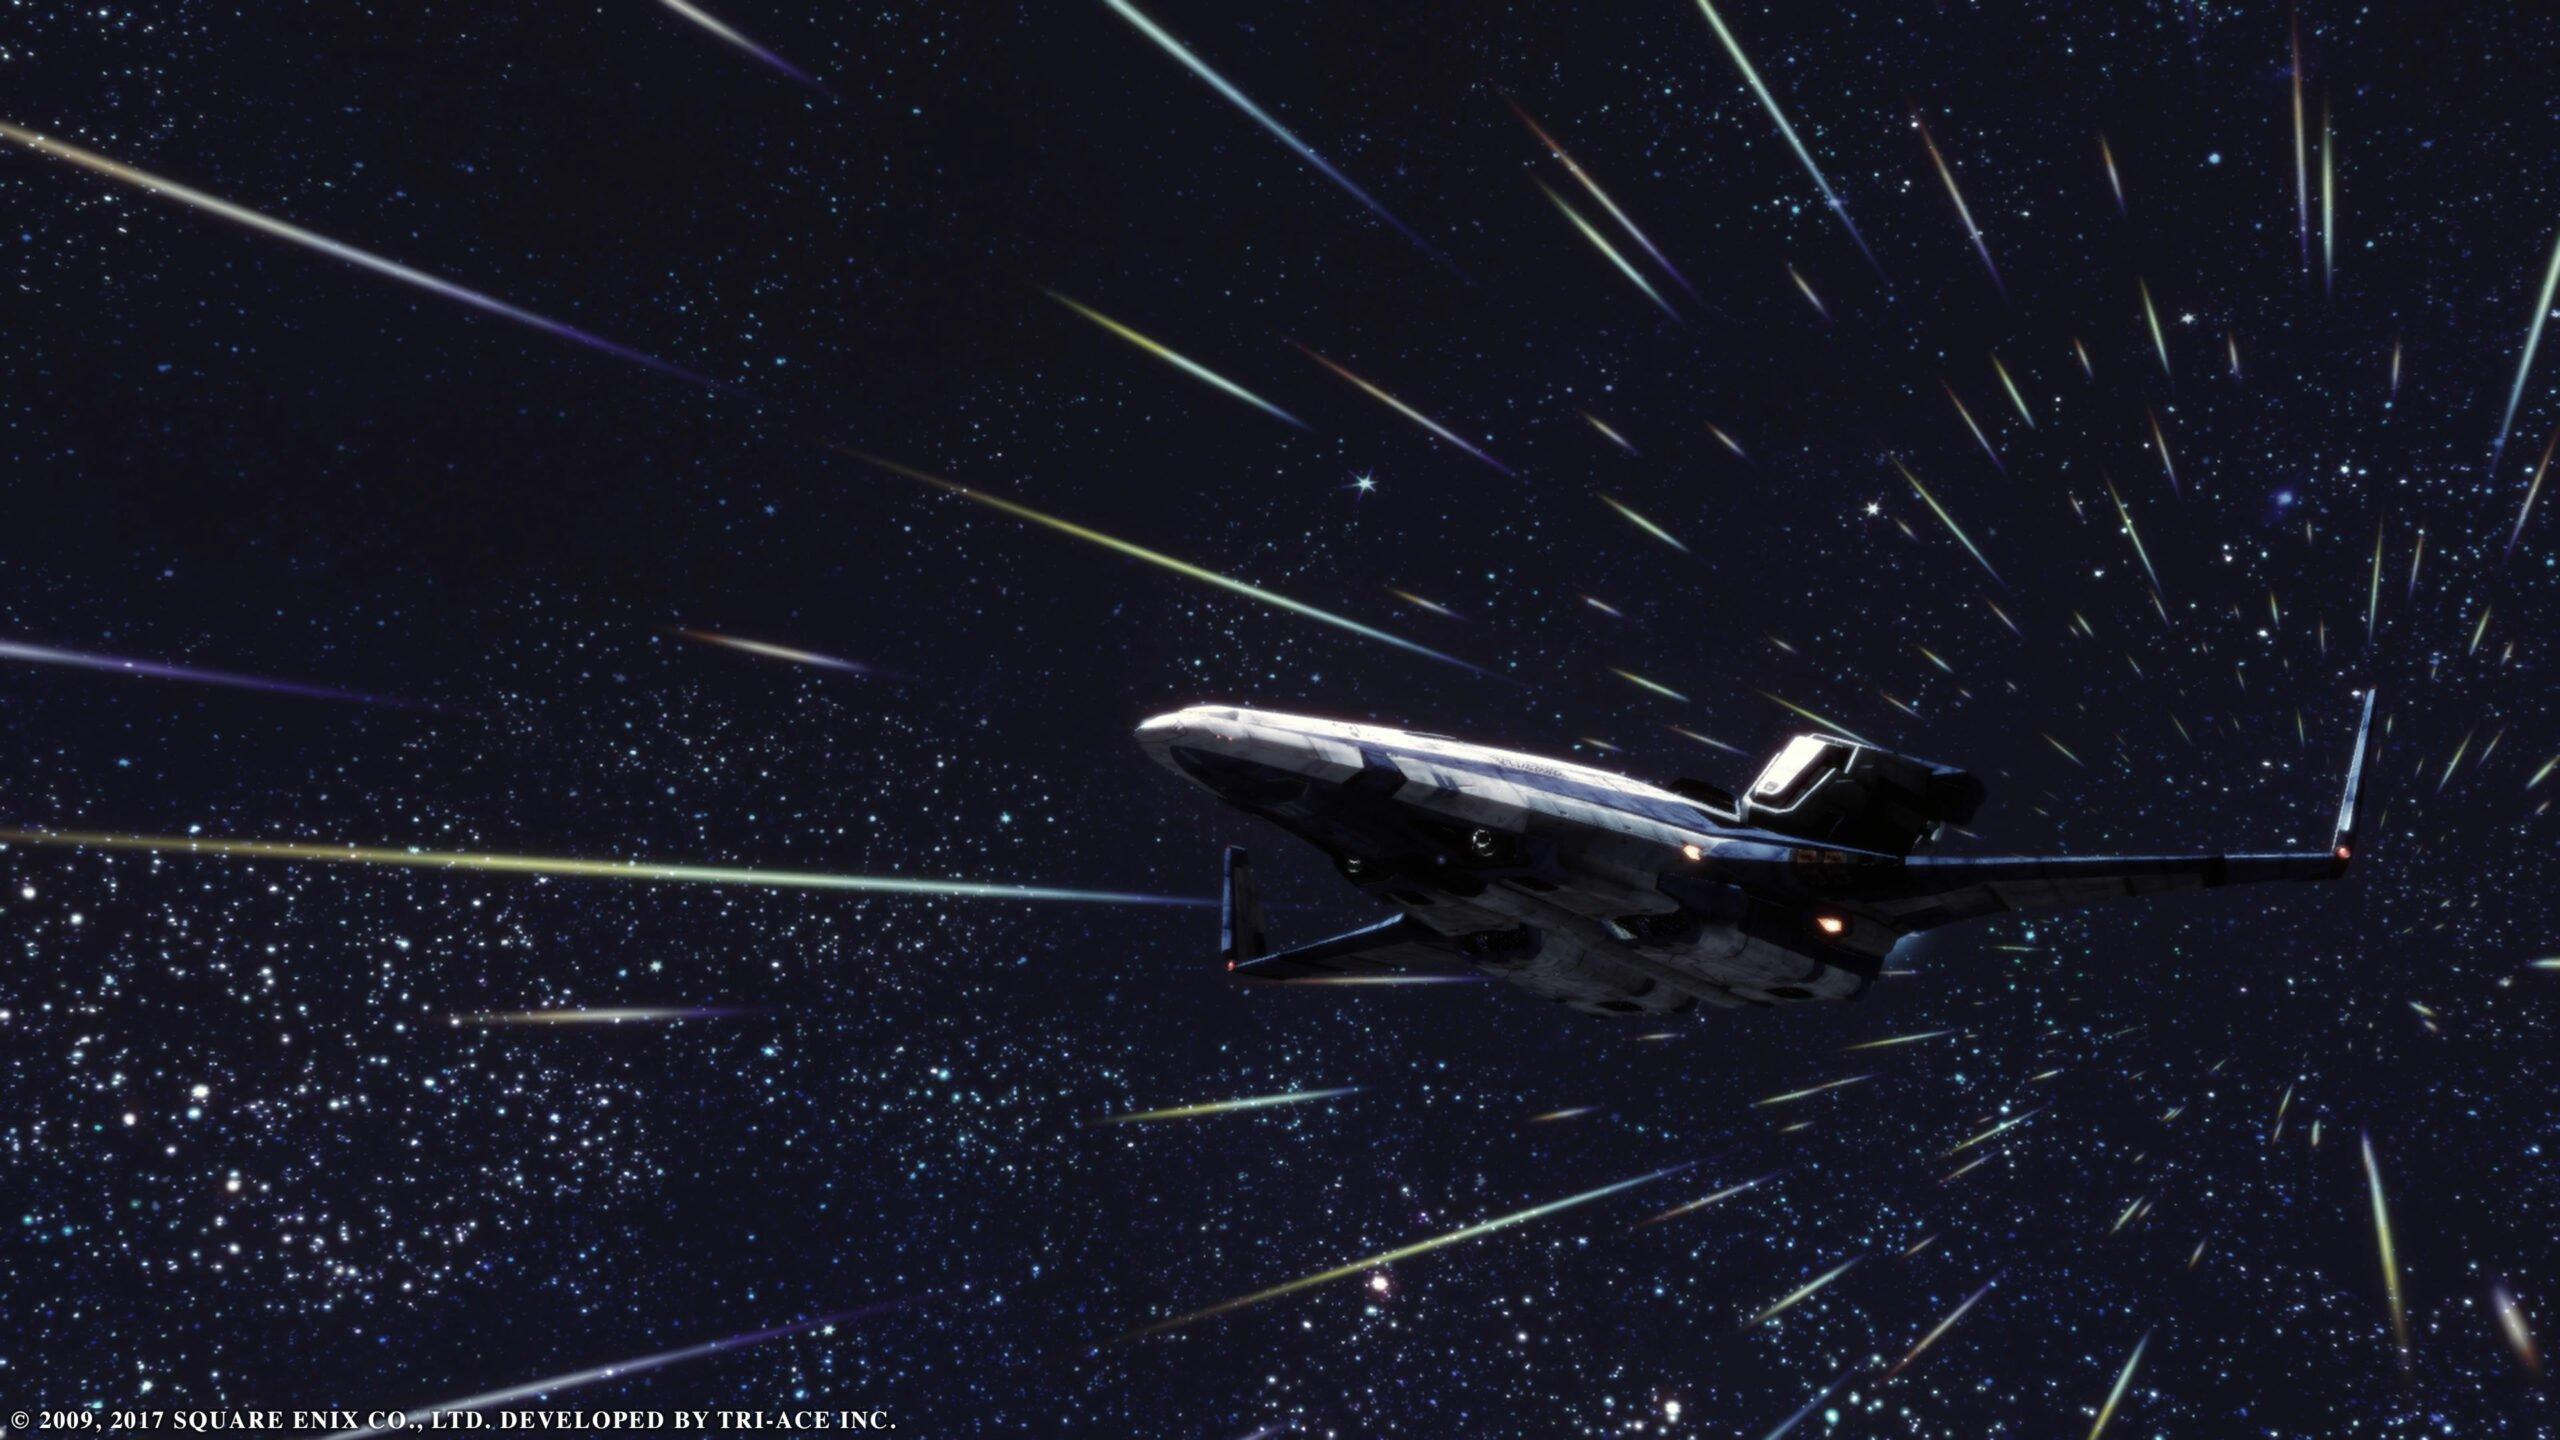 Star-Ocean-The-Last-Hope-4K-and-Full-HD-Remaster_2017_10-18-17_005